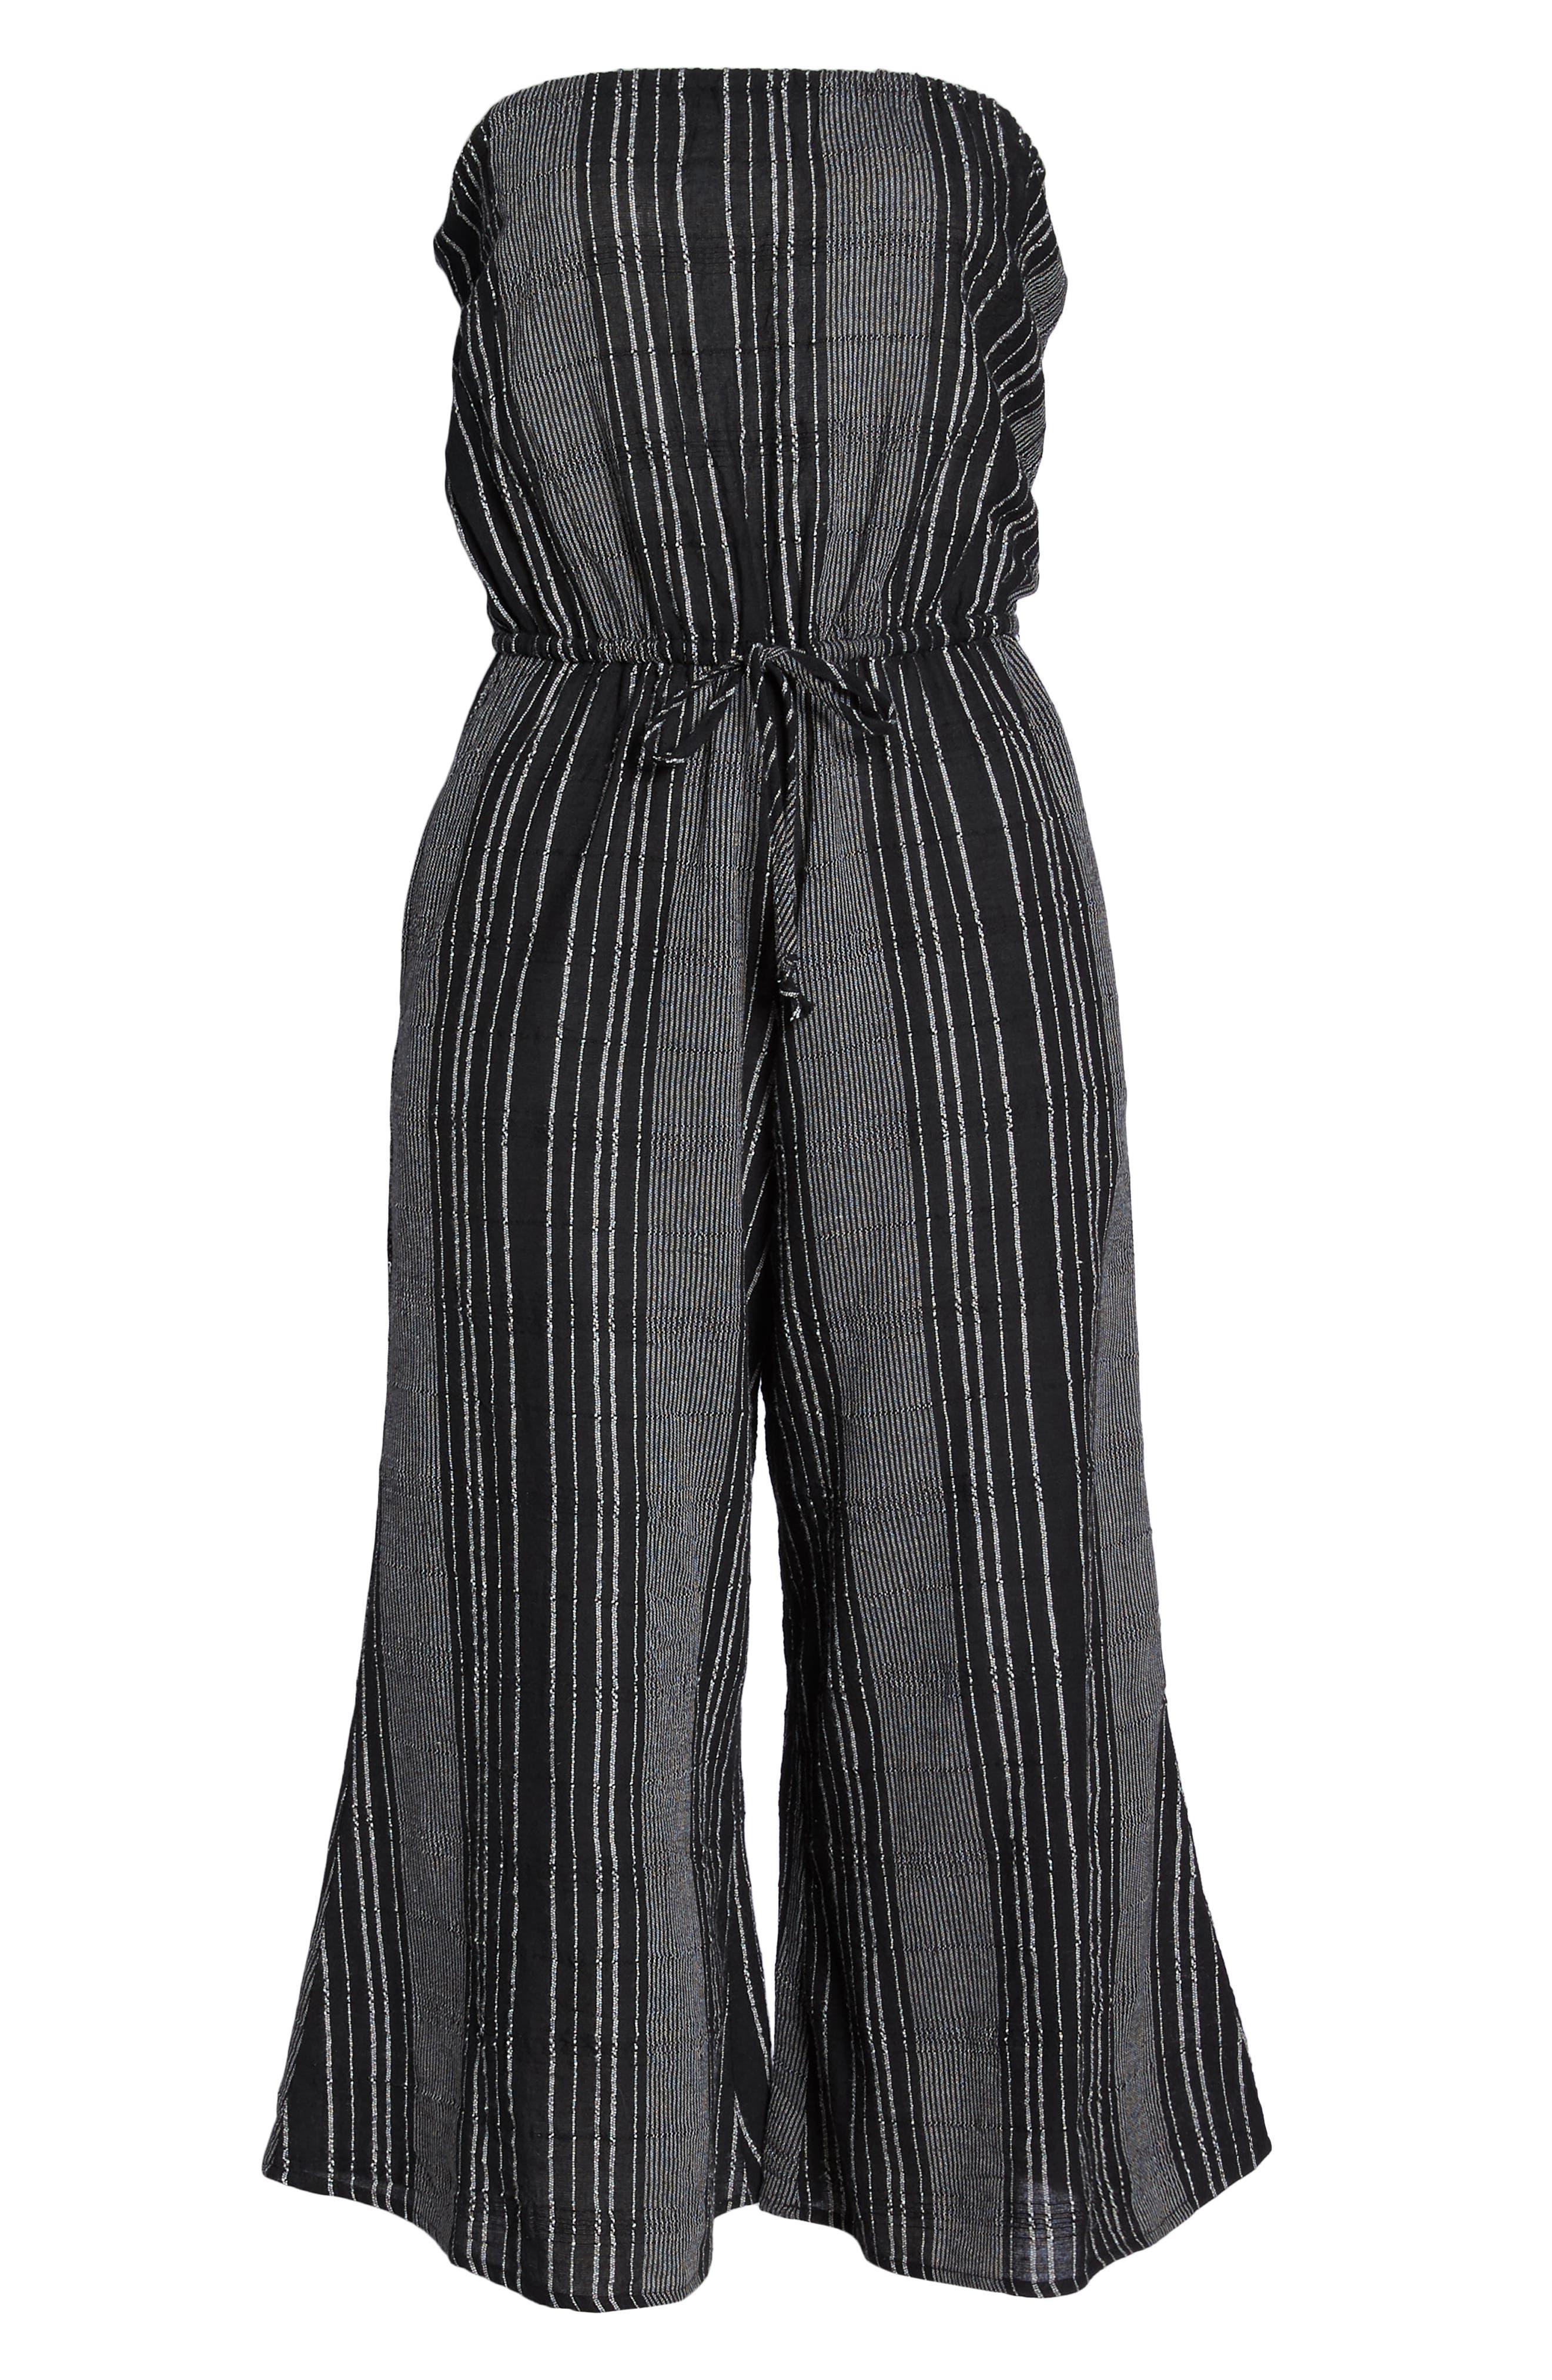 Strapless Cover-Up Culotte Jumpsuit,                             Alternate thumbnail 6, color,                             BLACK/ WHITE STRIPE